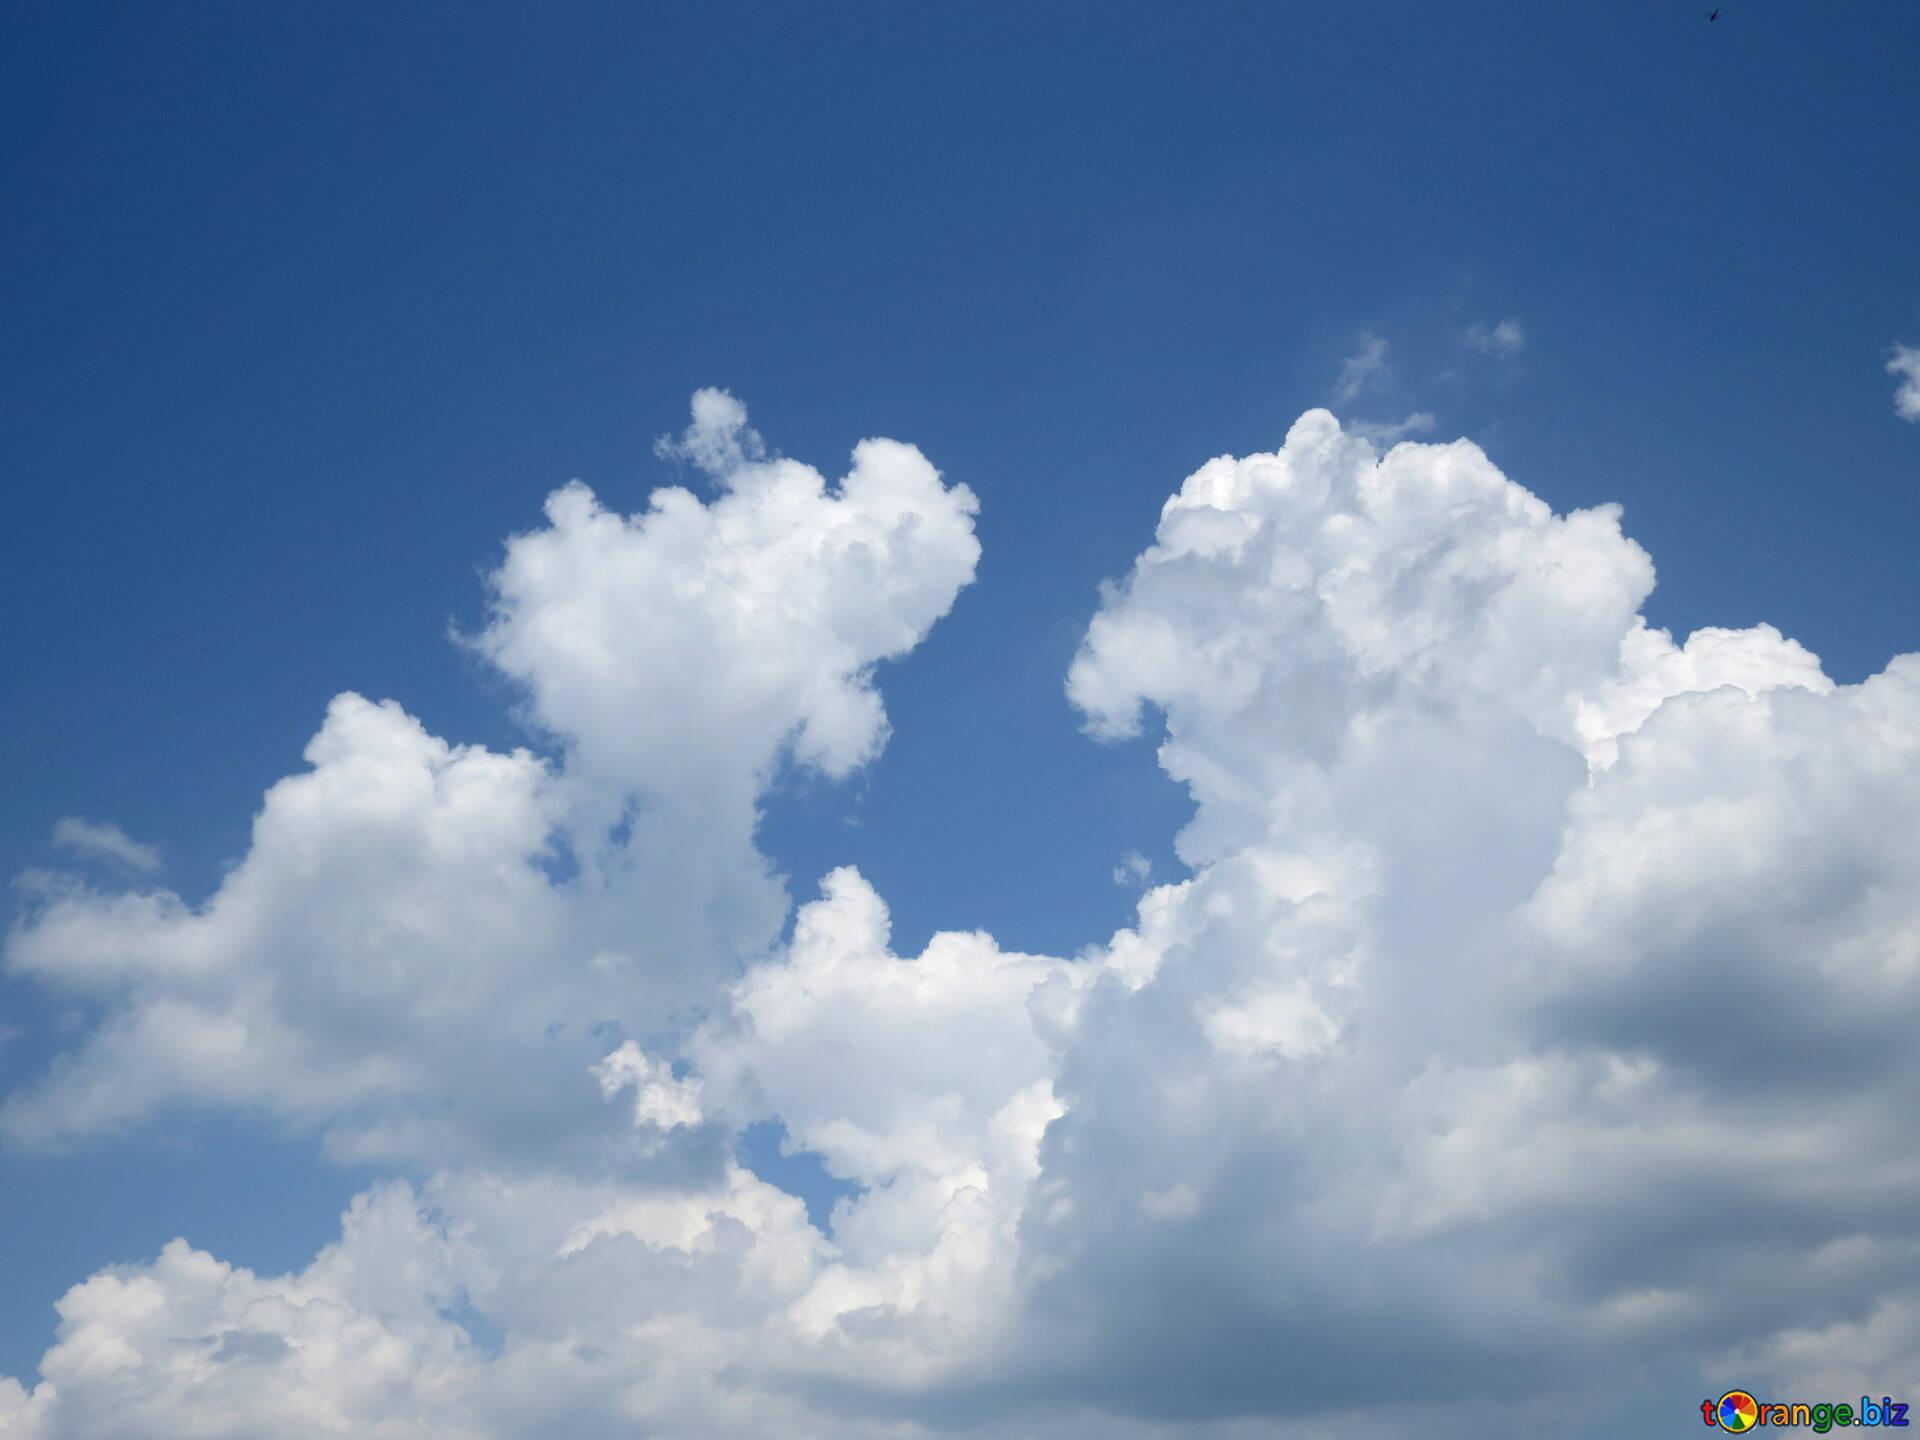 Wolken am himmel himmel mit wolken himmel № 31572